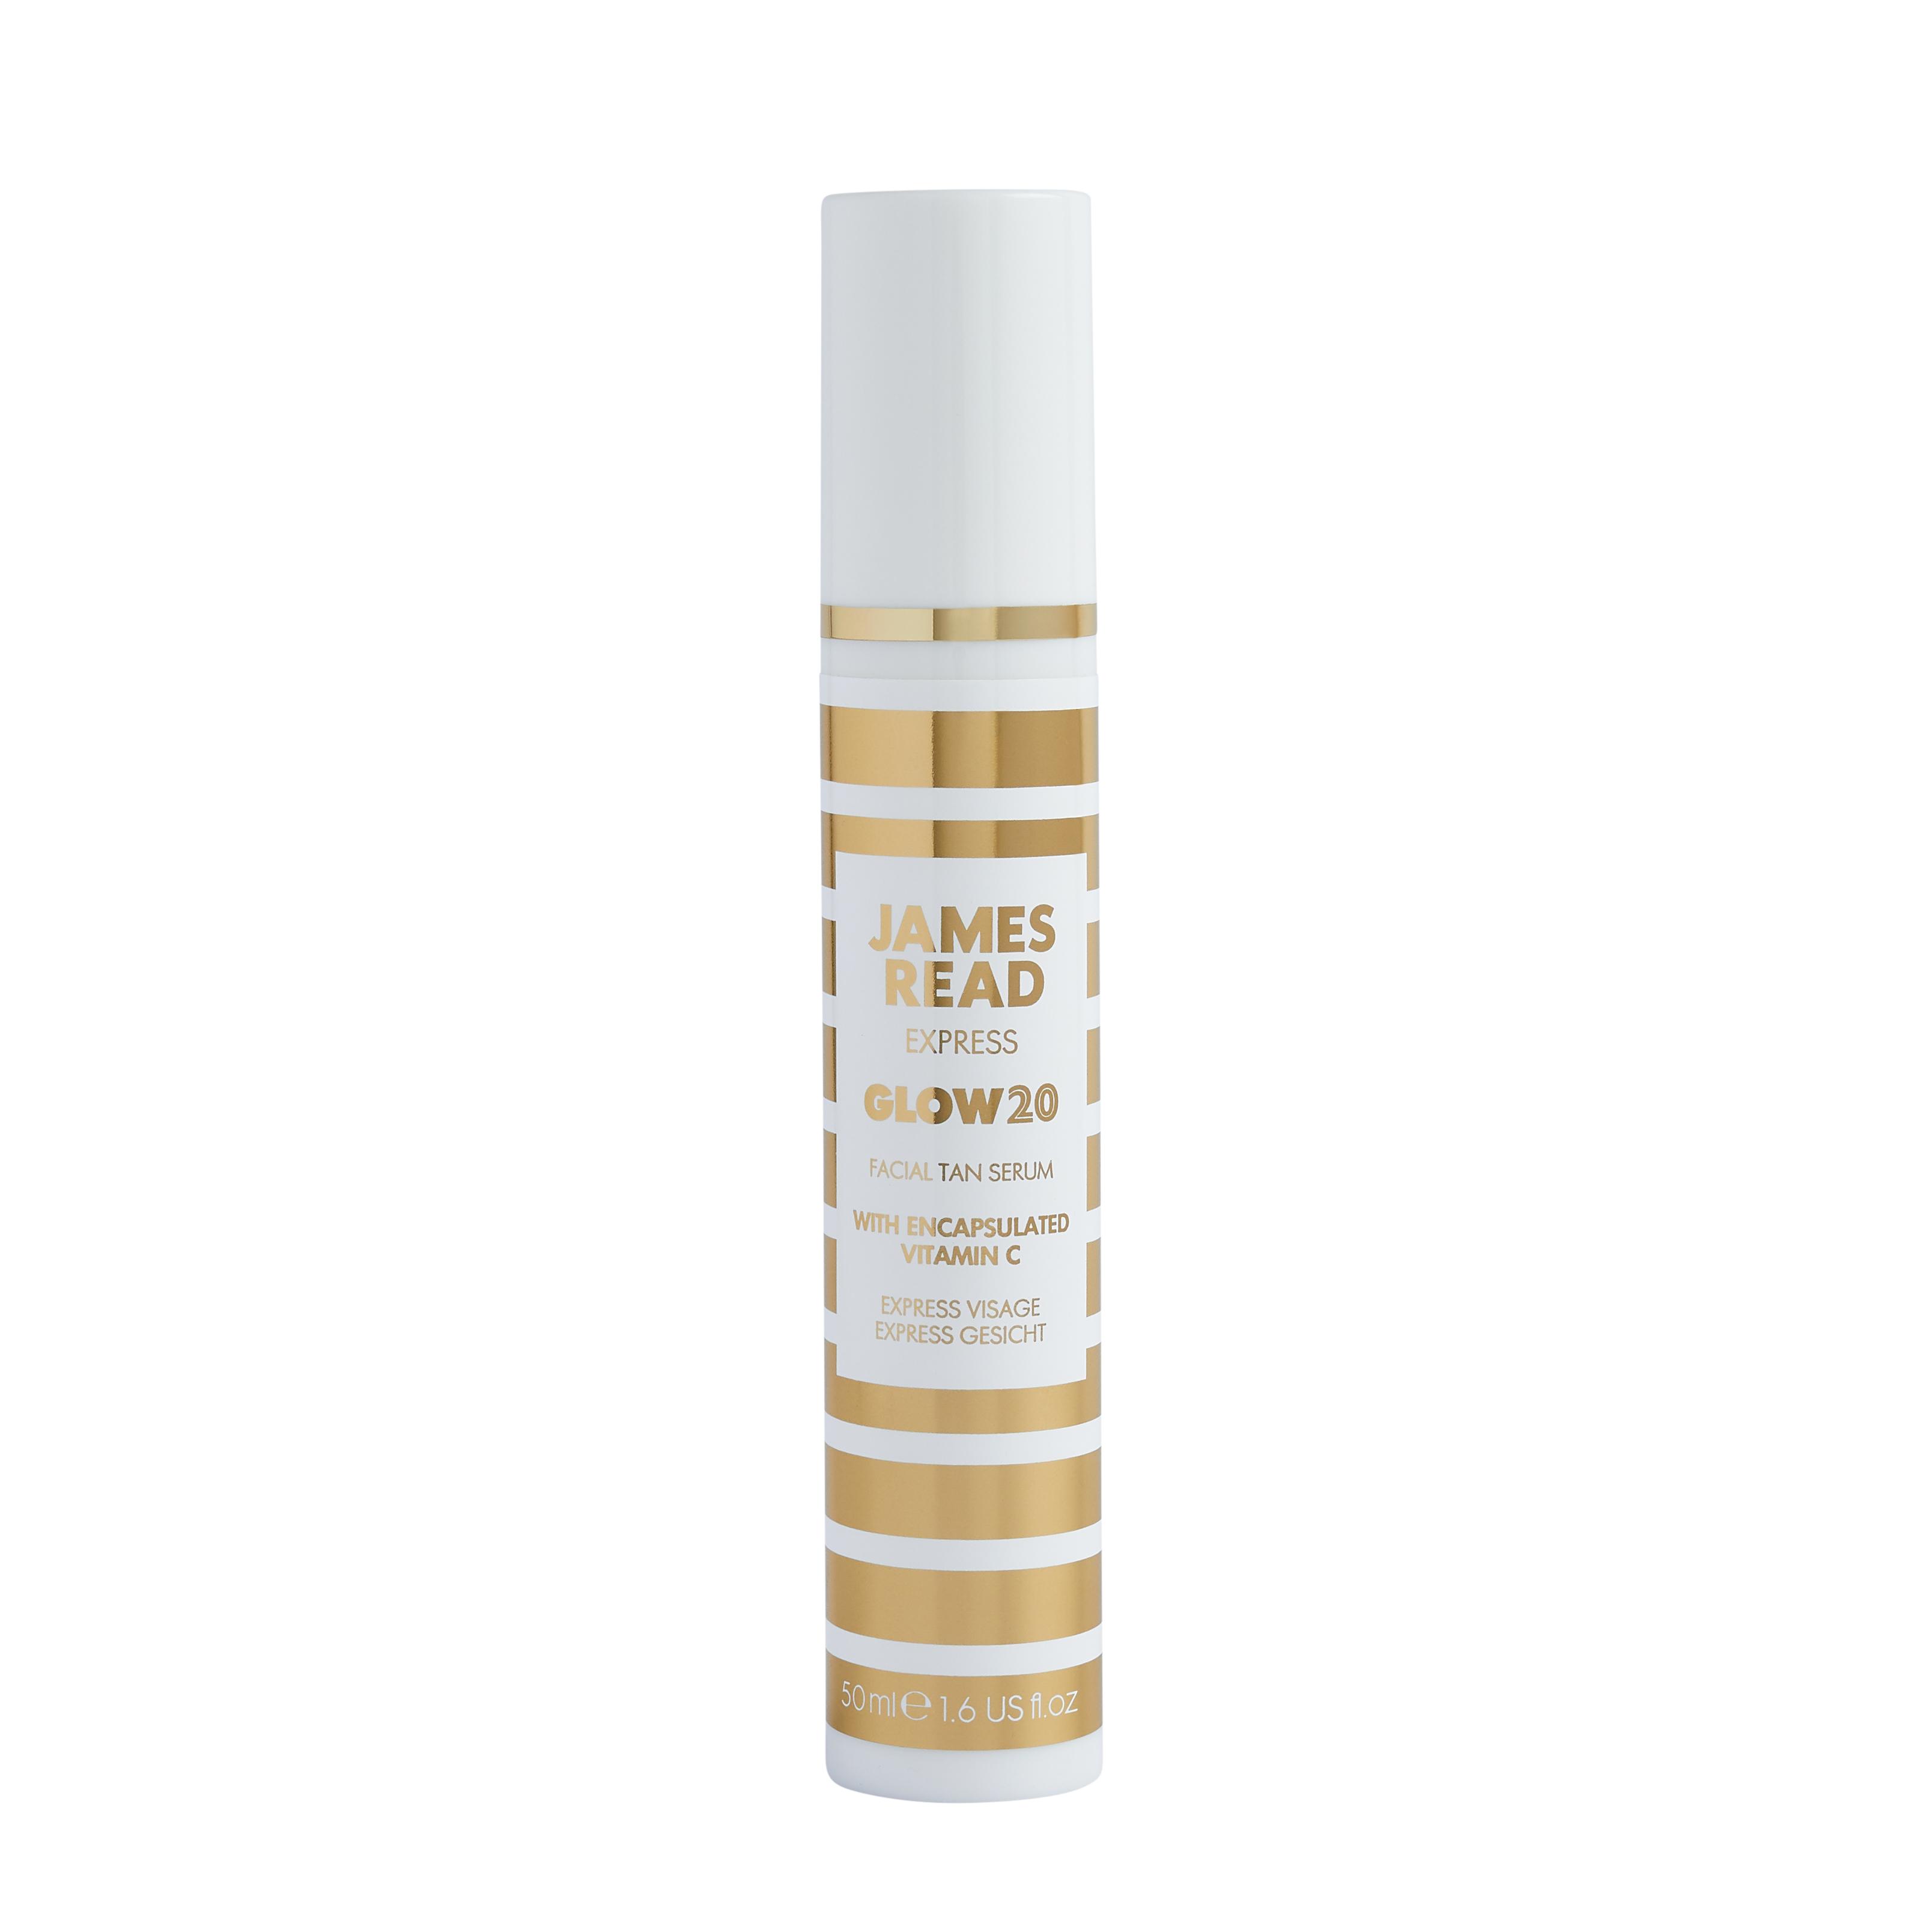 James Read Glow20 Facial Tan Serum, 50 ml